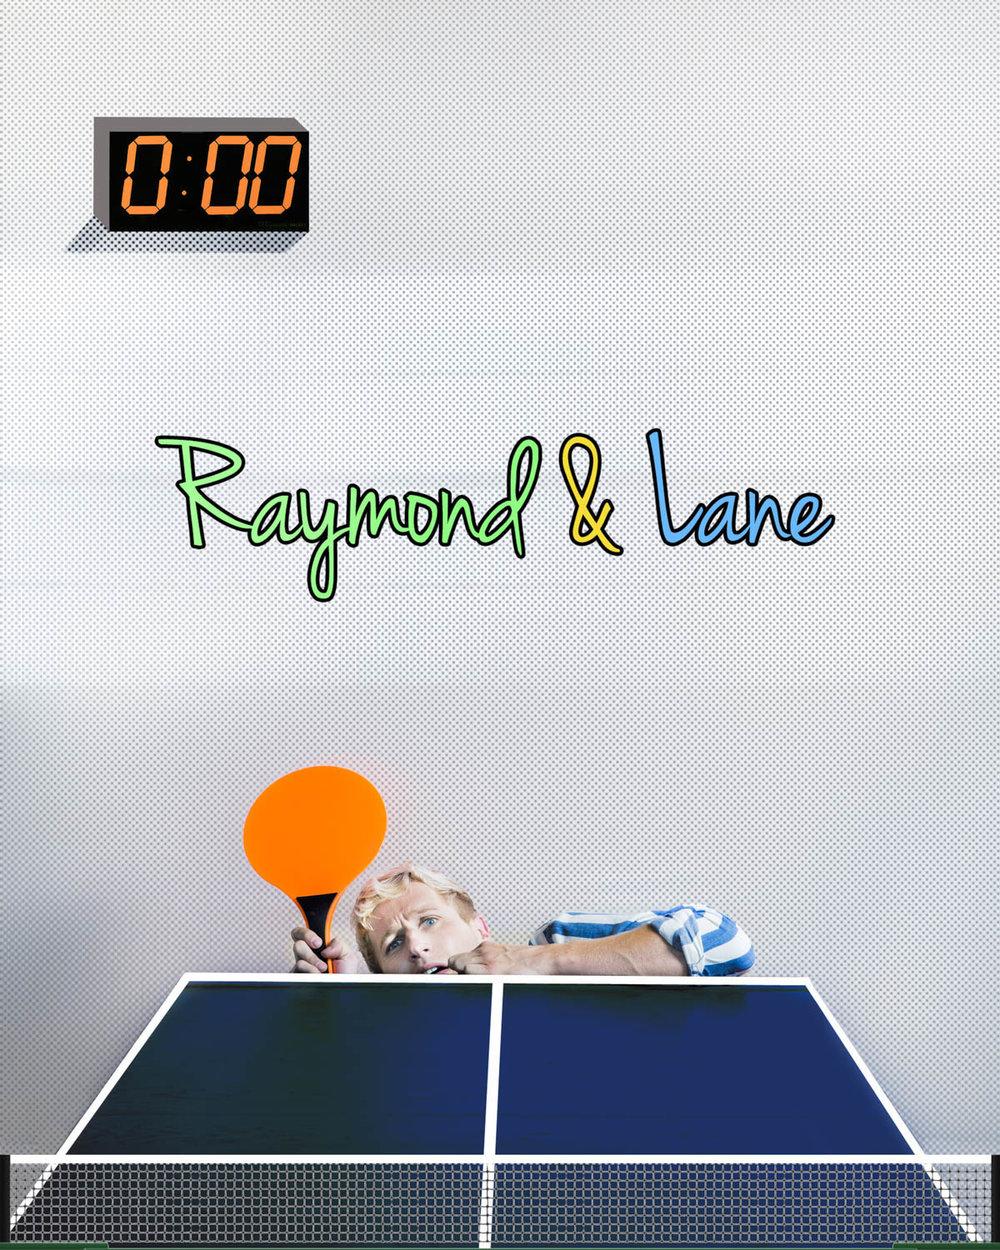 160429_RaymondLane_0252-Edit6_Final2.jpg